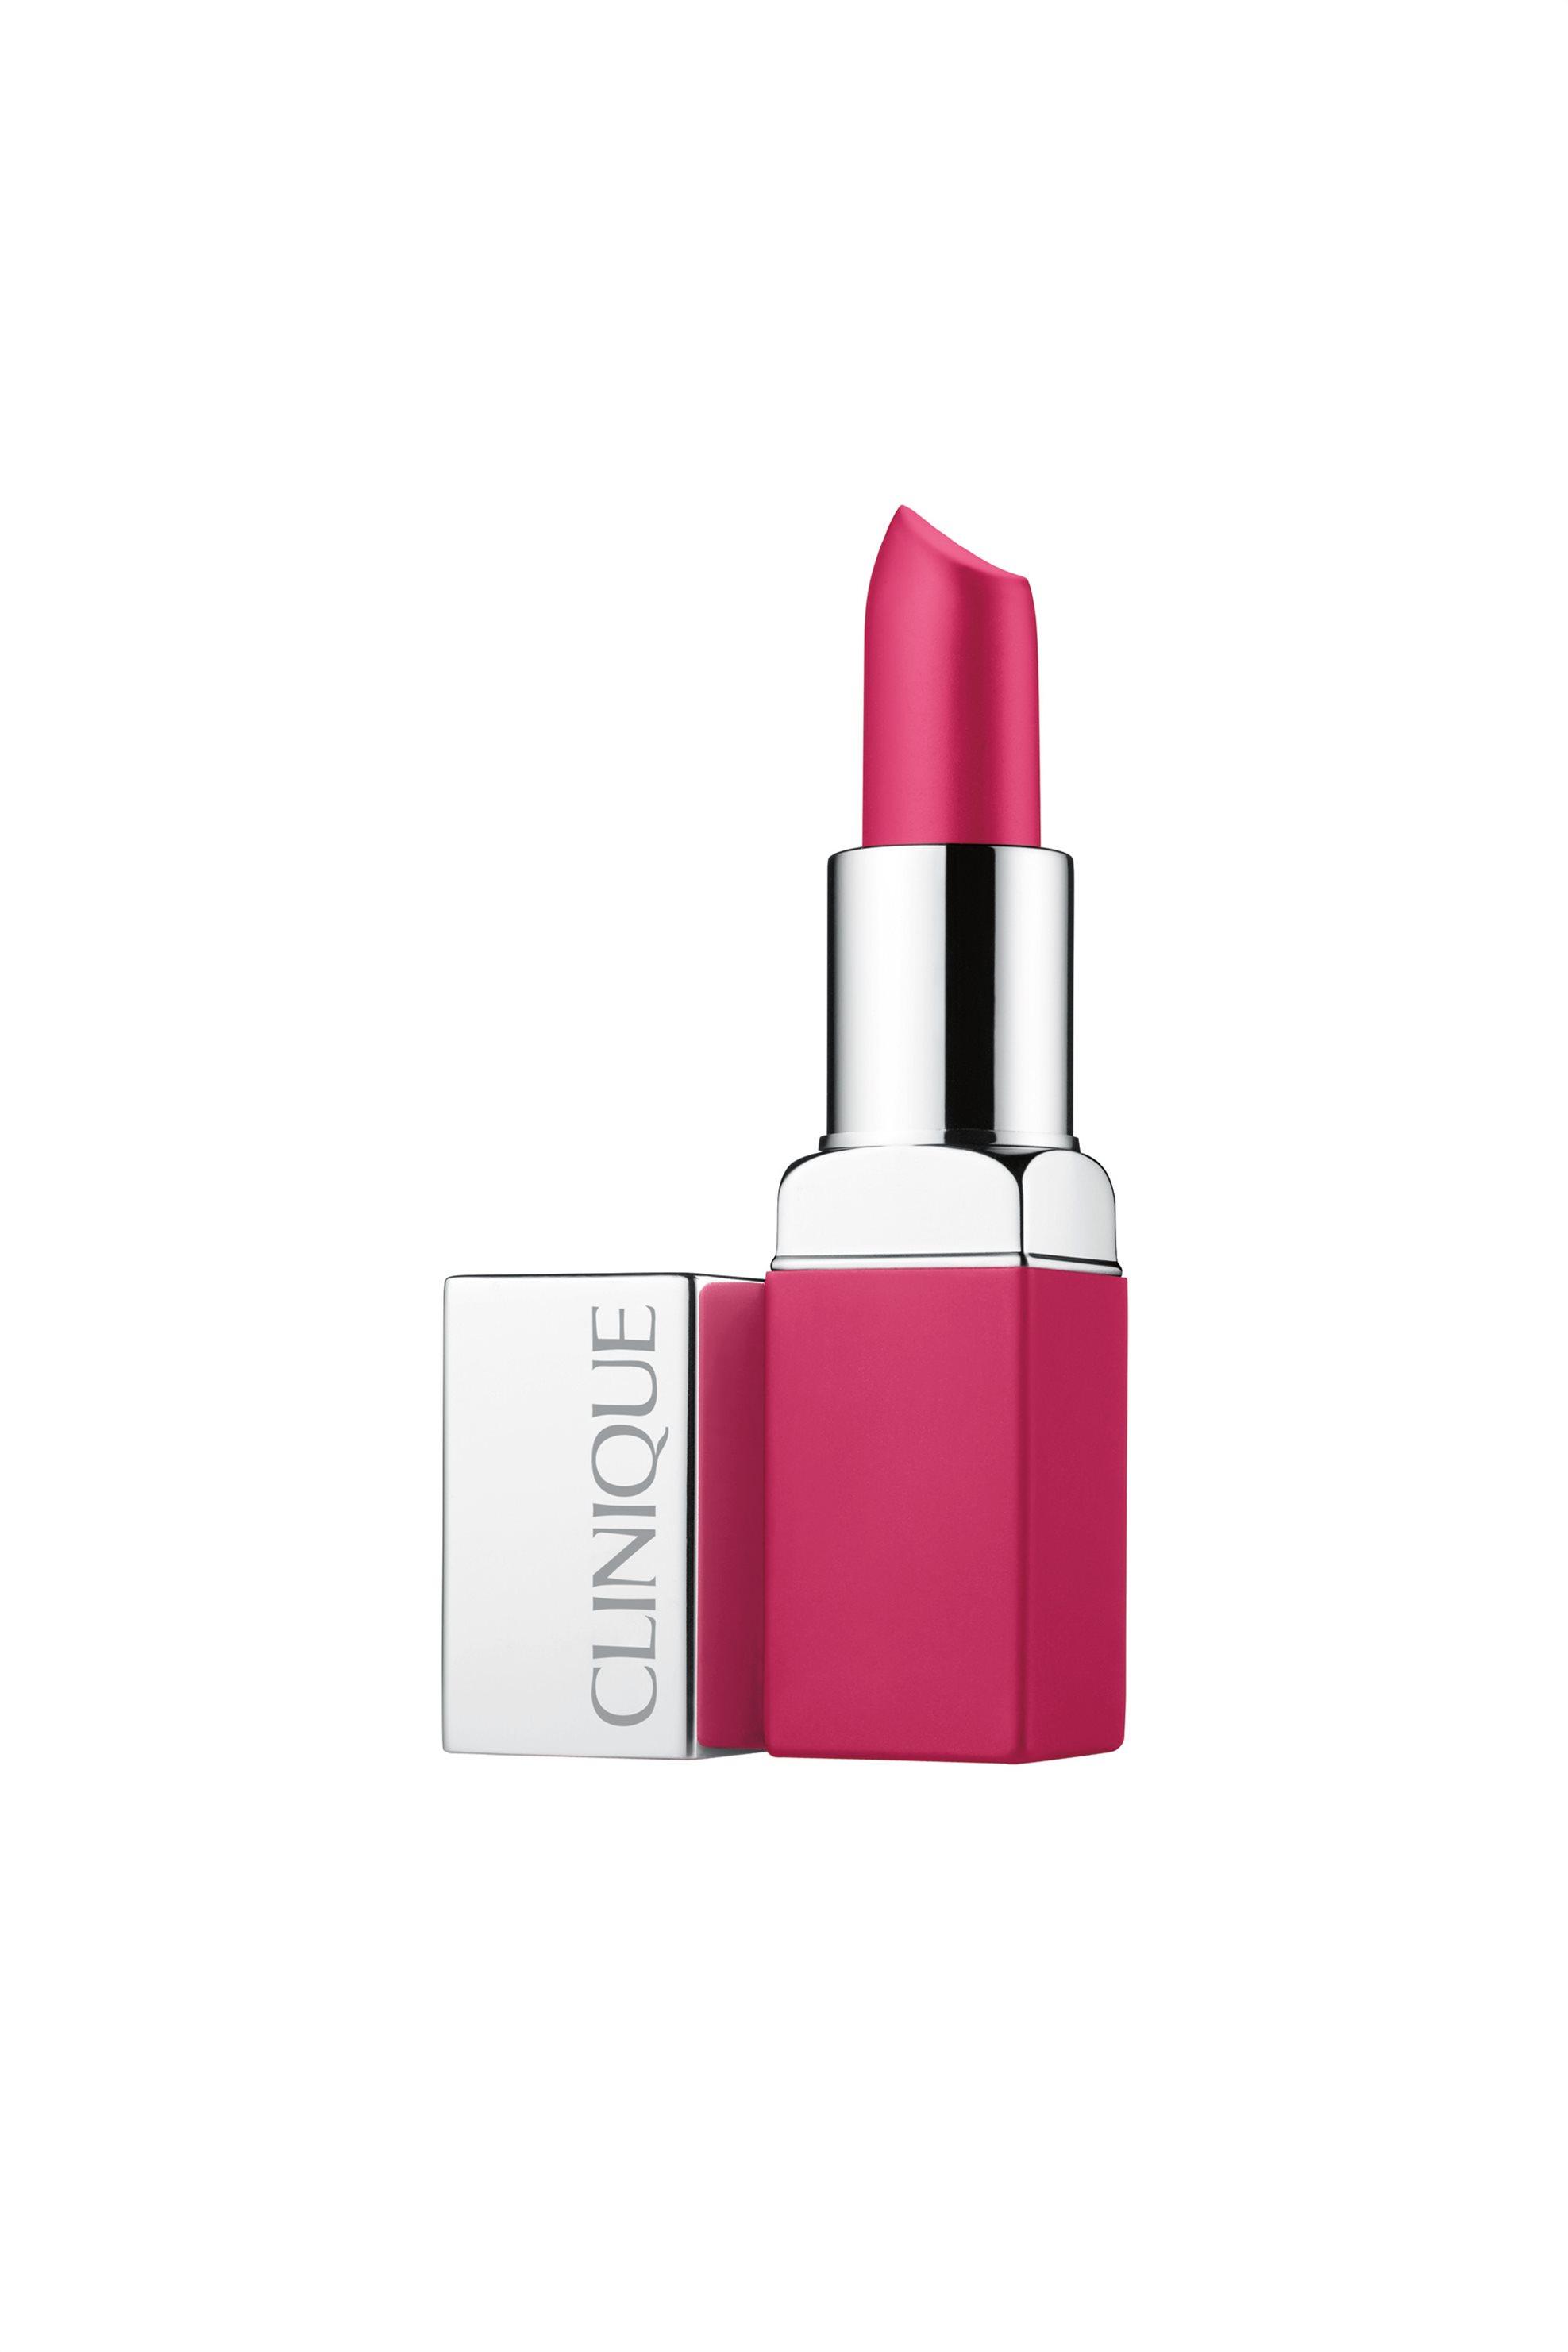 Clinique Pop™ Matte Lip Colour + Primer 06 Rose Pop 3.9 gr. - ZTPH060000 ομορφια   καλλυντικα επιλεκτικησ   μακιγιάζ   χείλη   κραγιόν